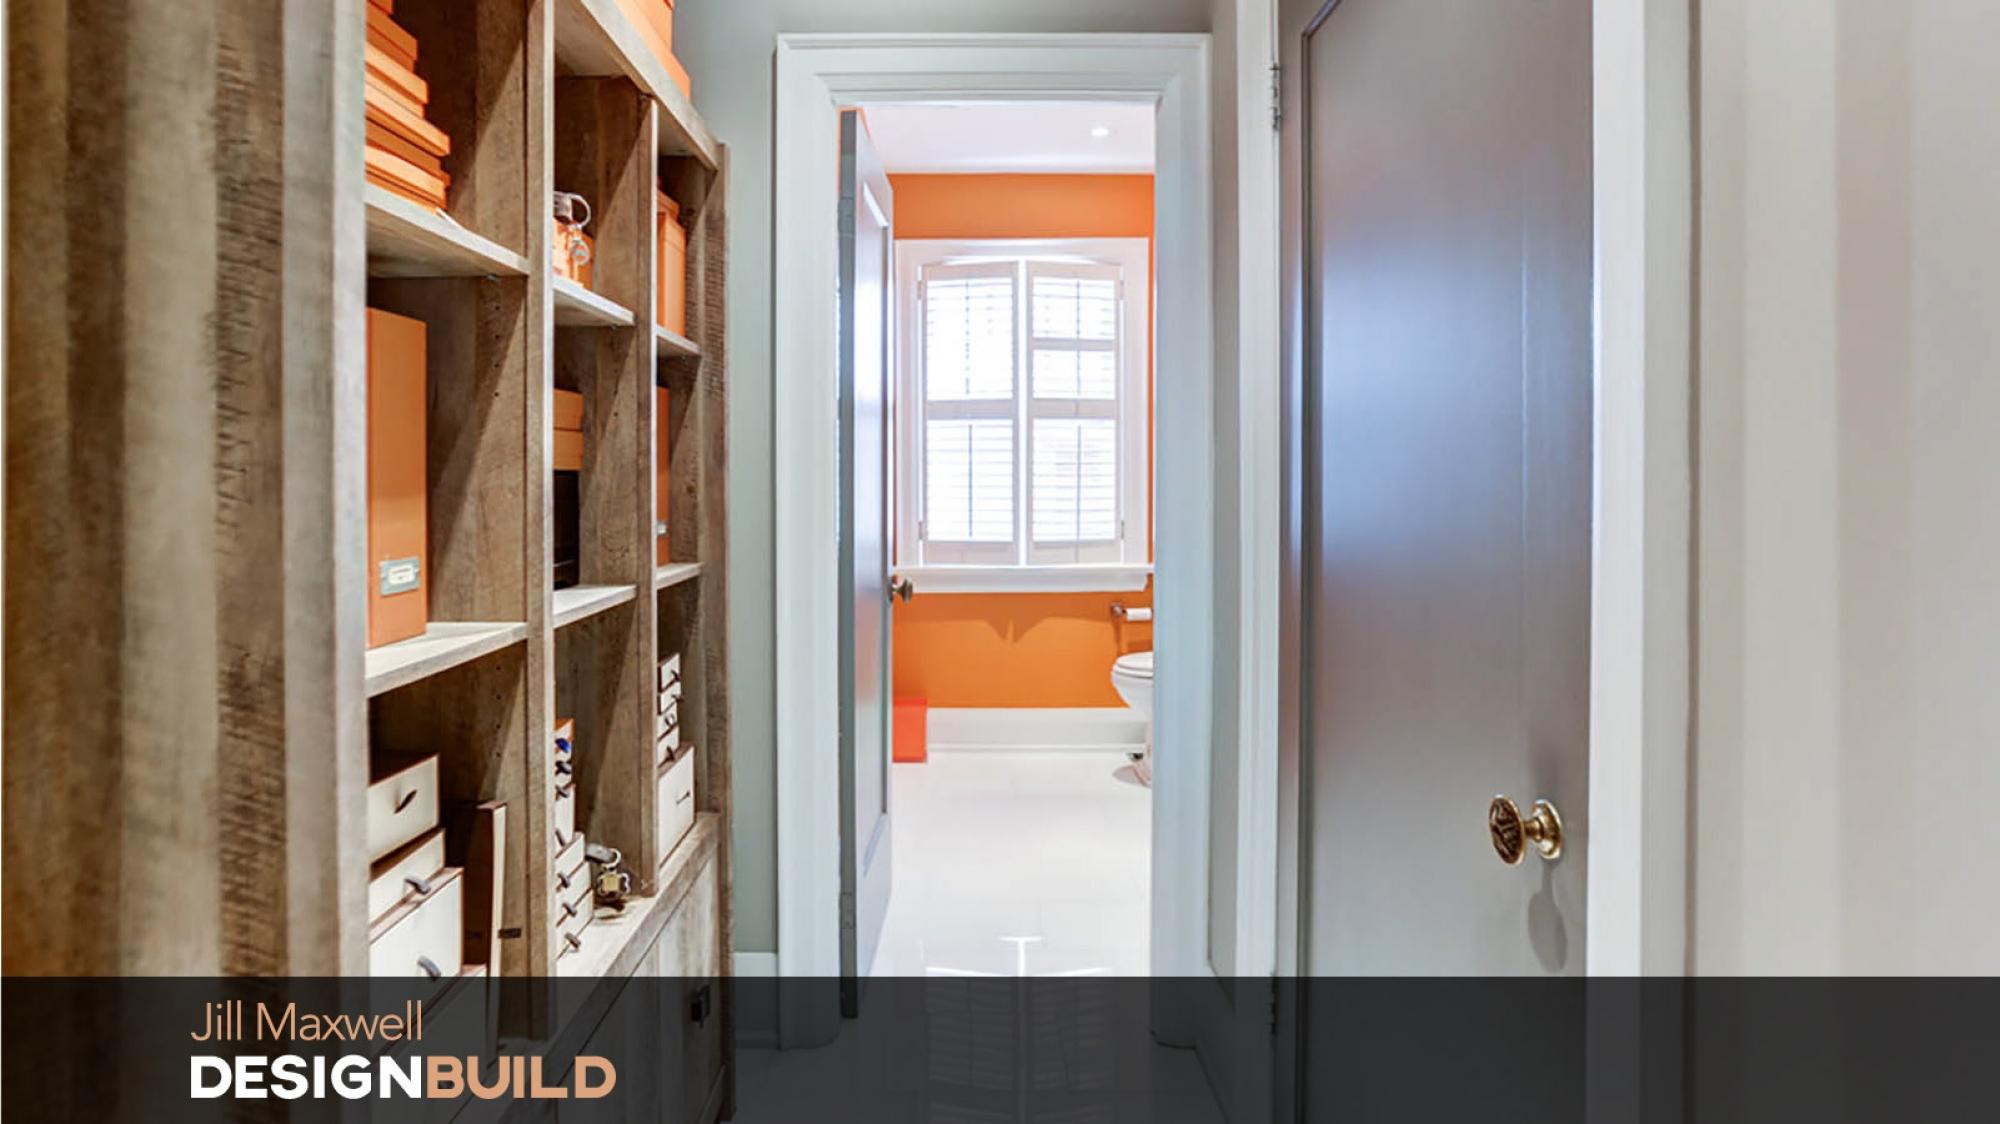 01-1-A-Jill_Maxwell_design_build_4